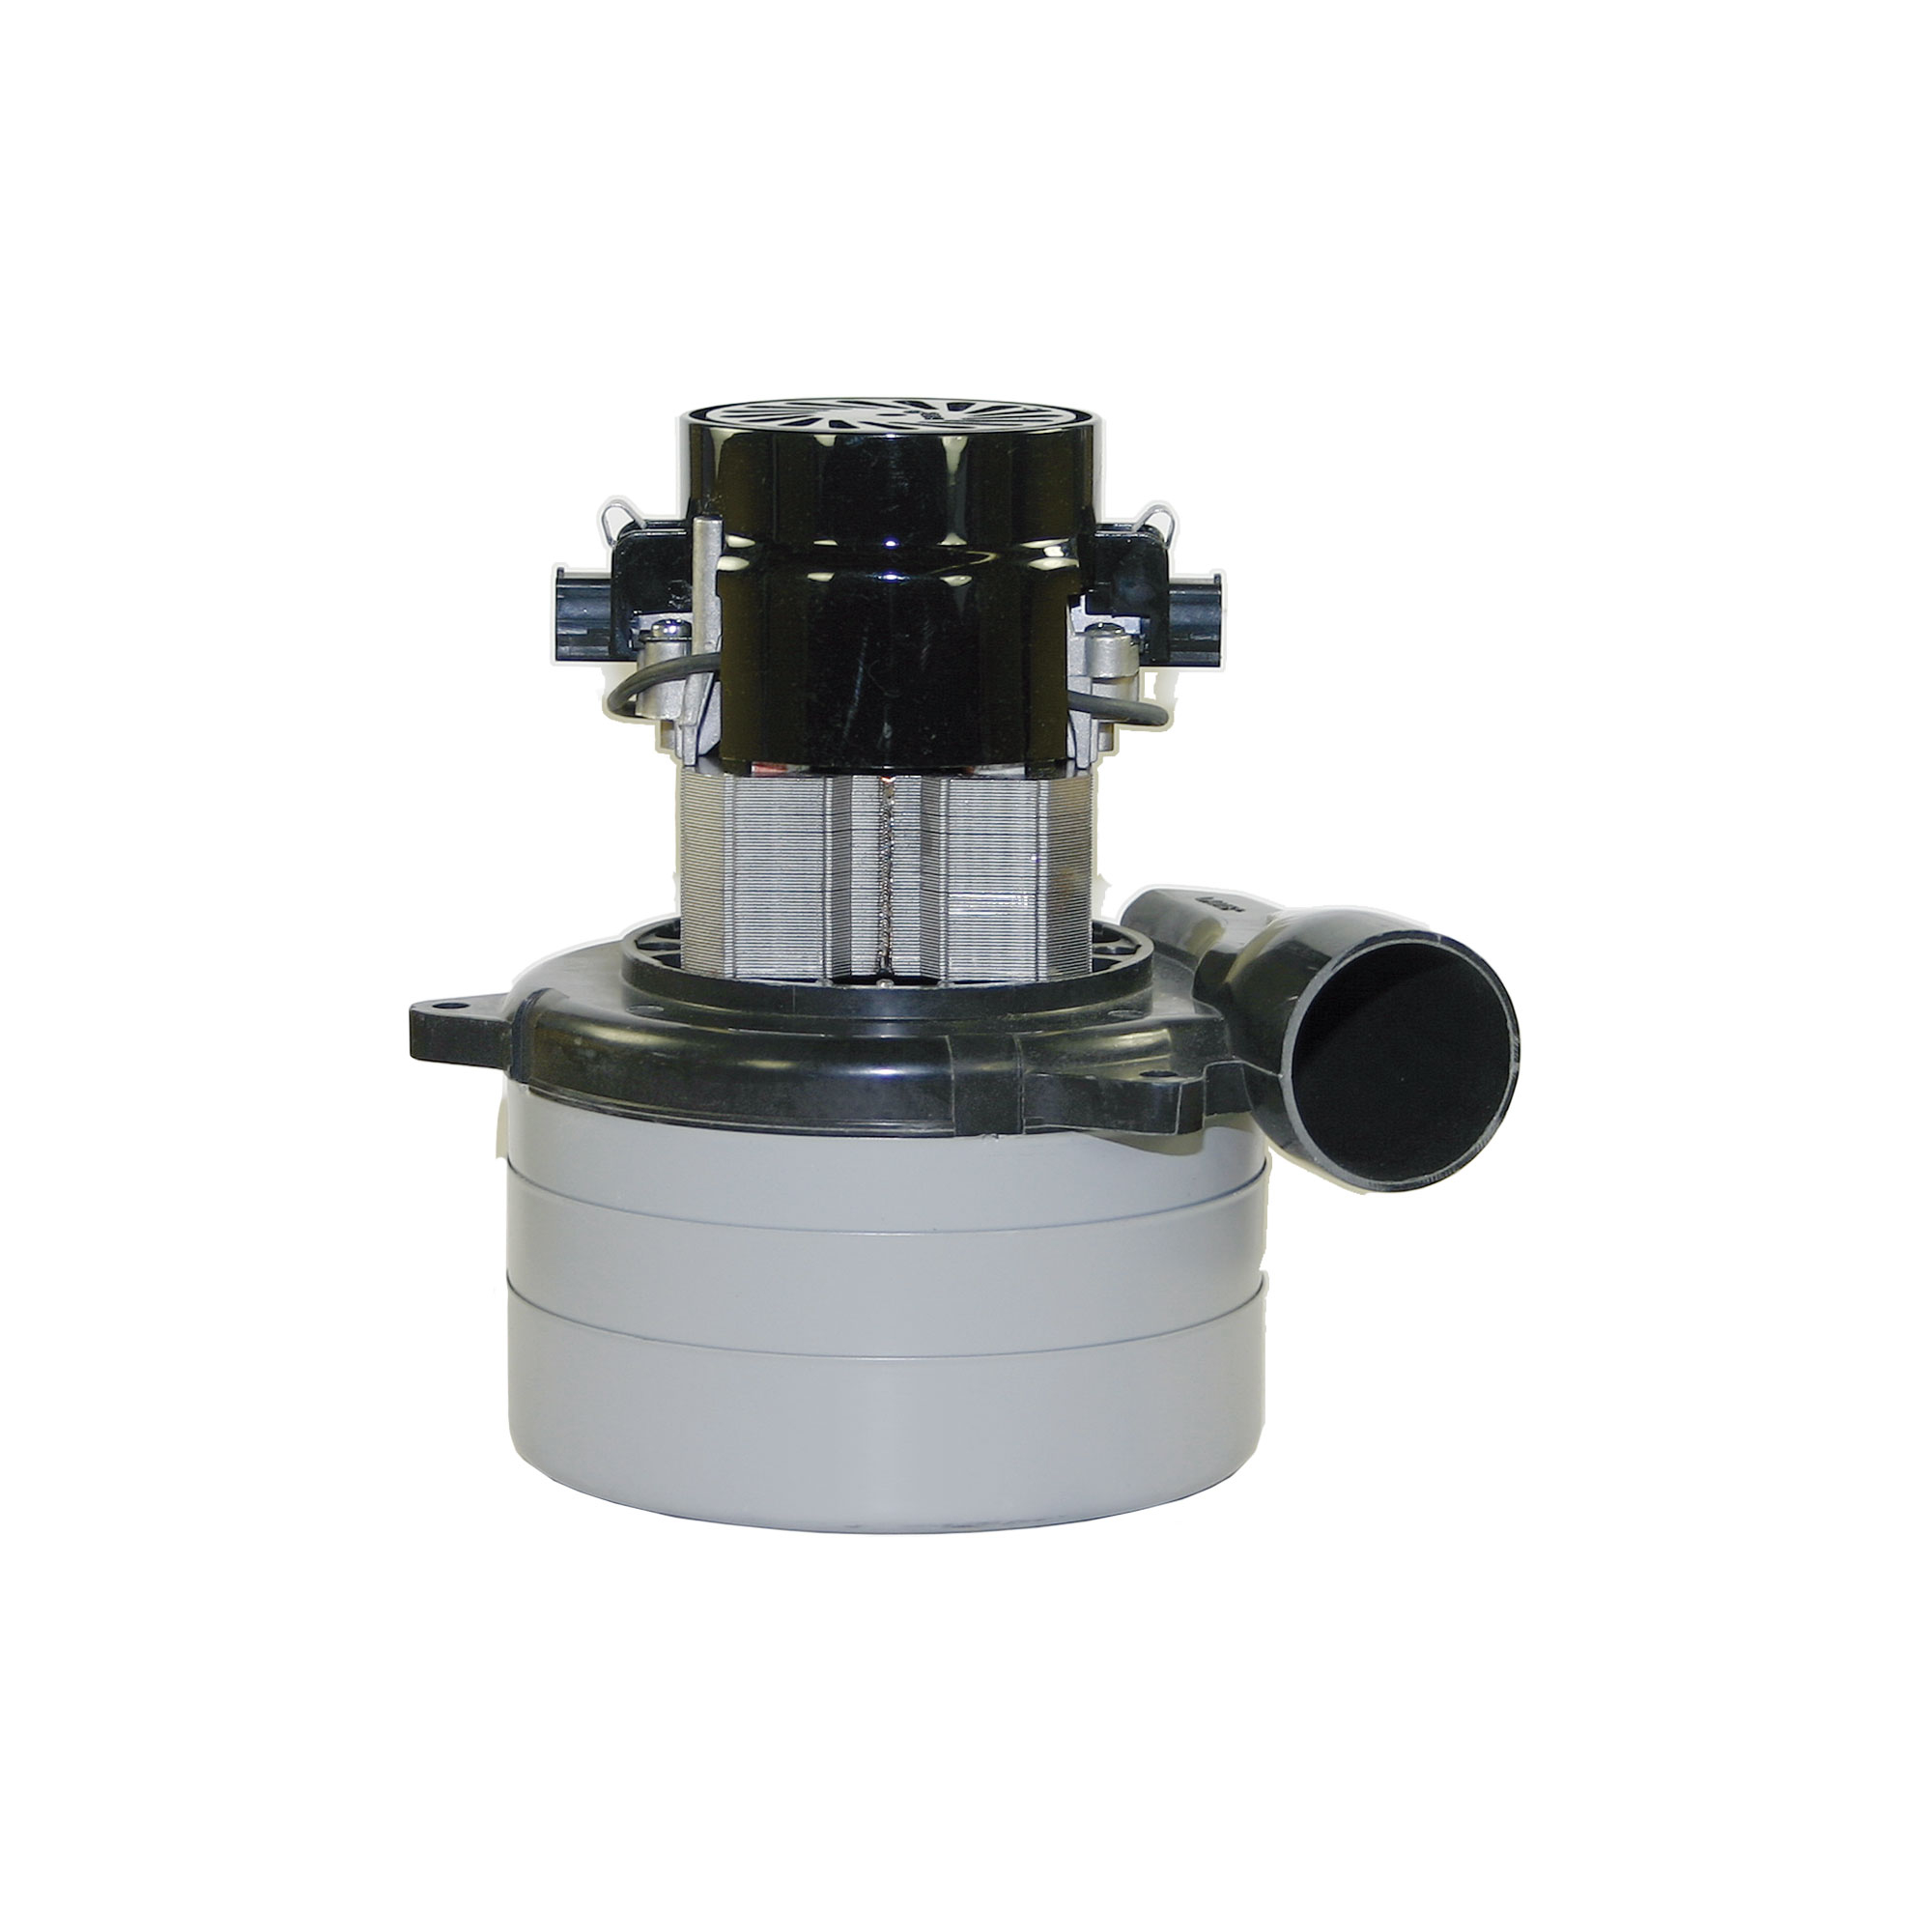 Turbine d'aspiration LAMB AMETEK 116 515-13